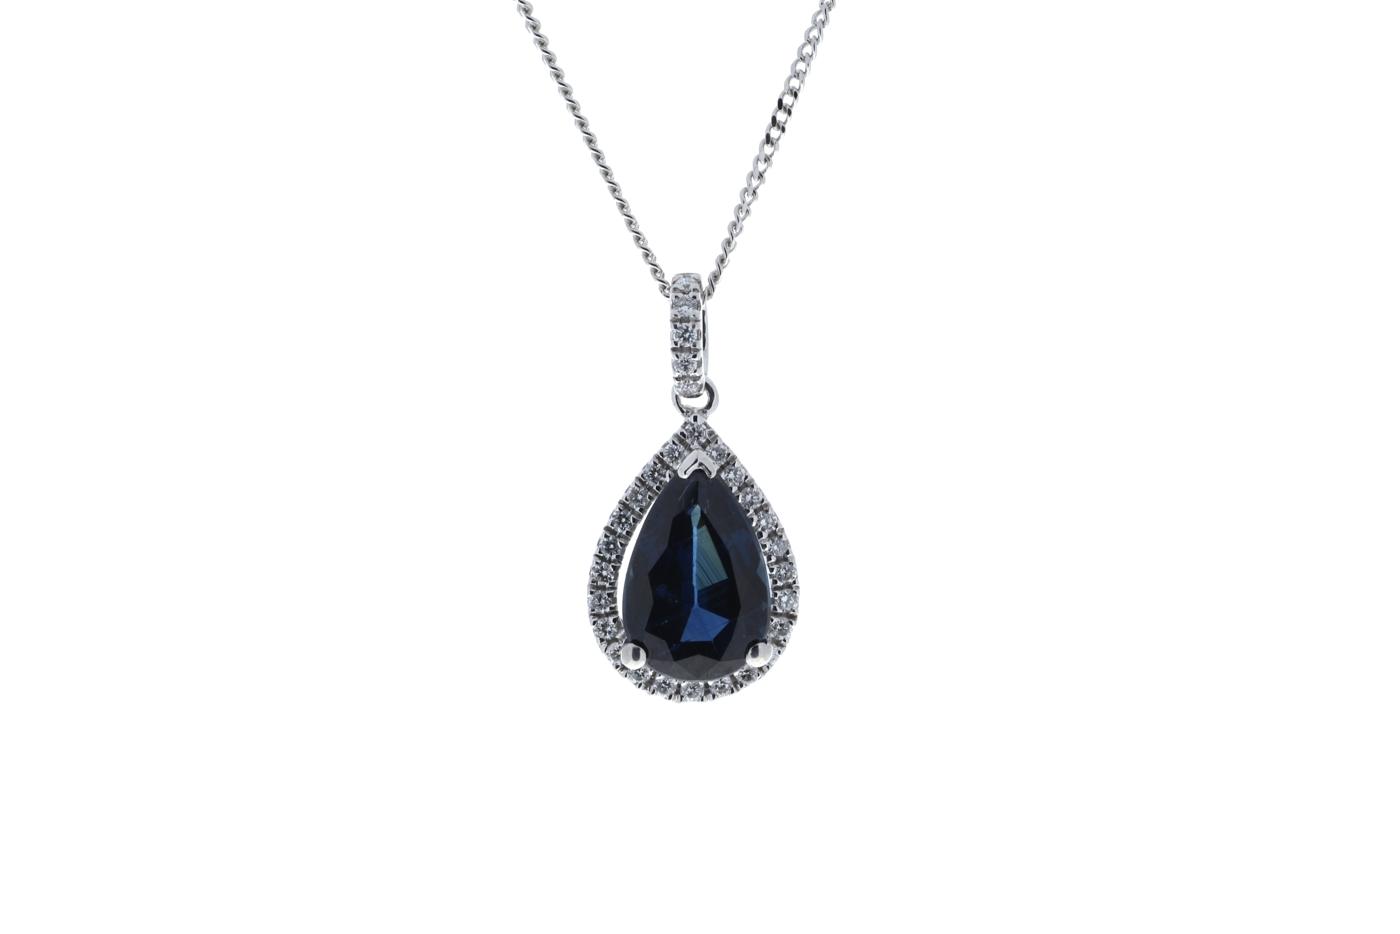 18ct White Gold Diamond And Sapphire Pendant 2.35 Carats